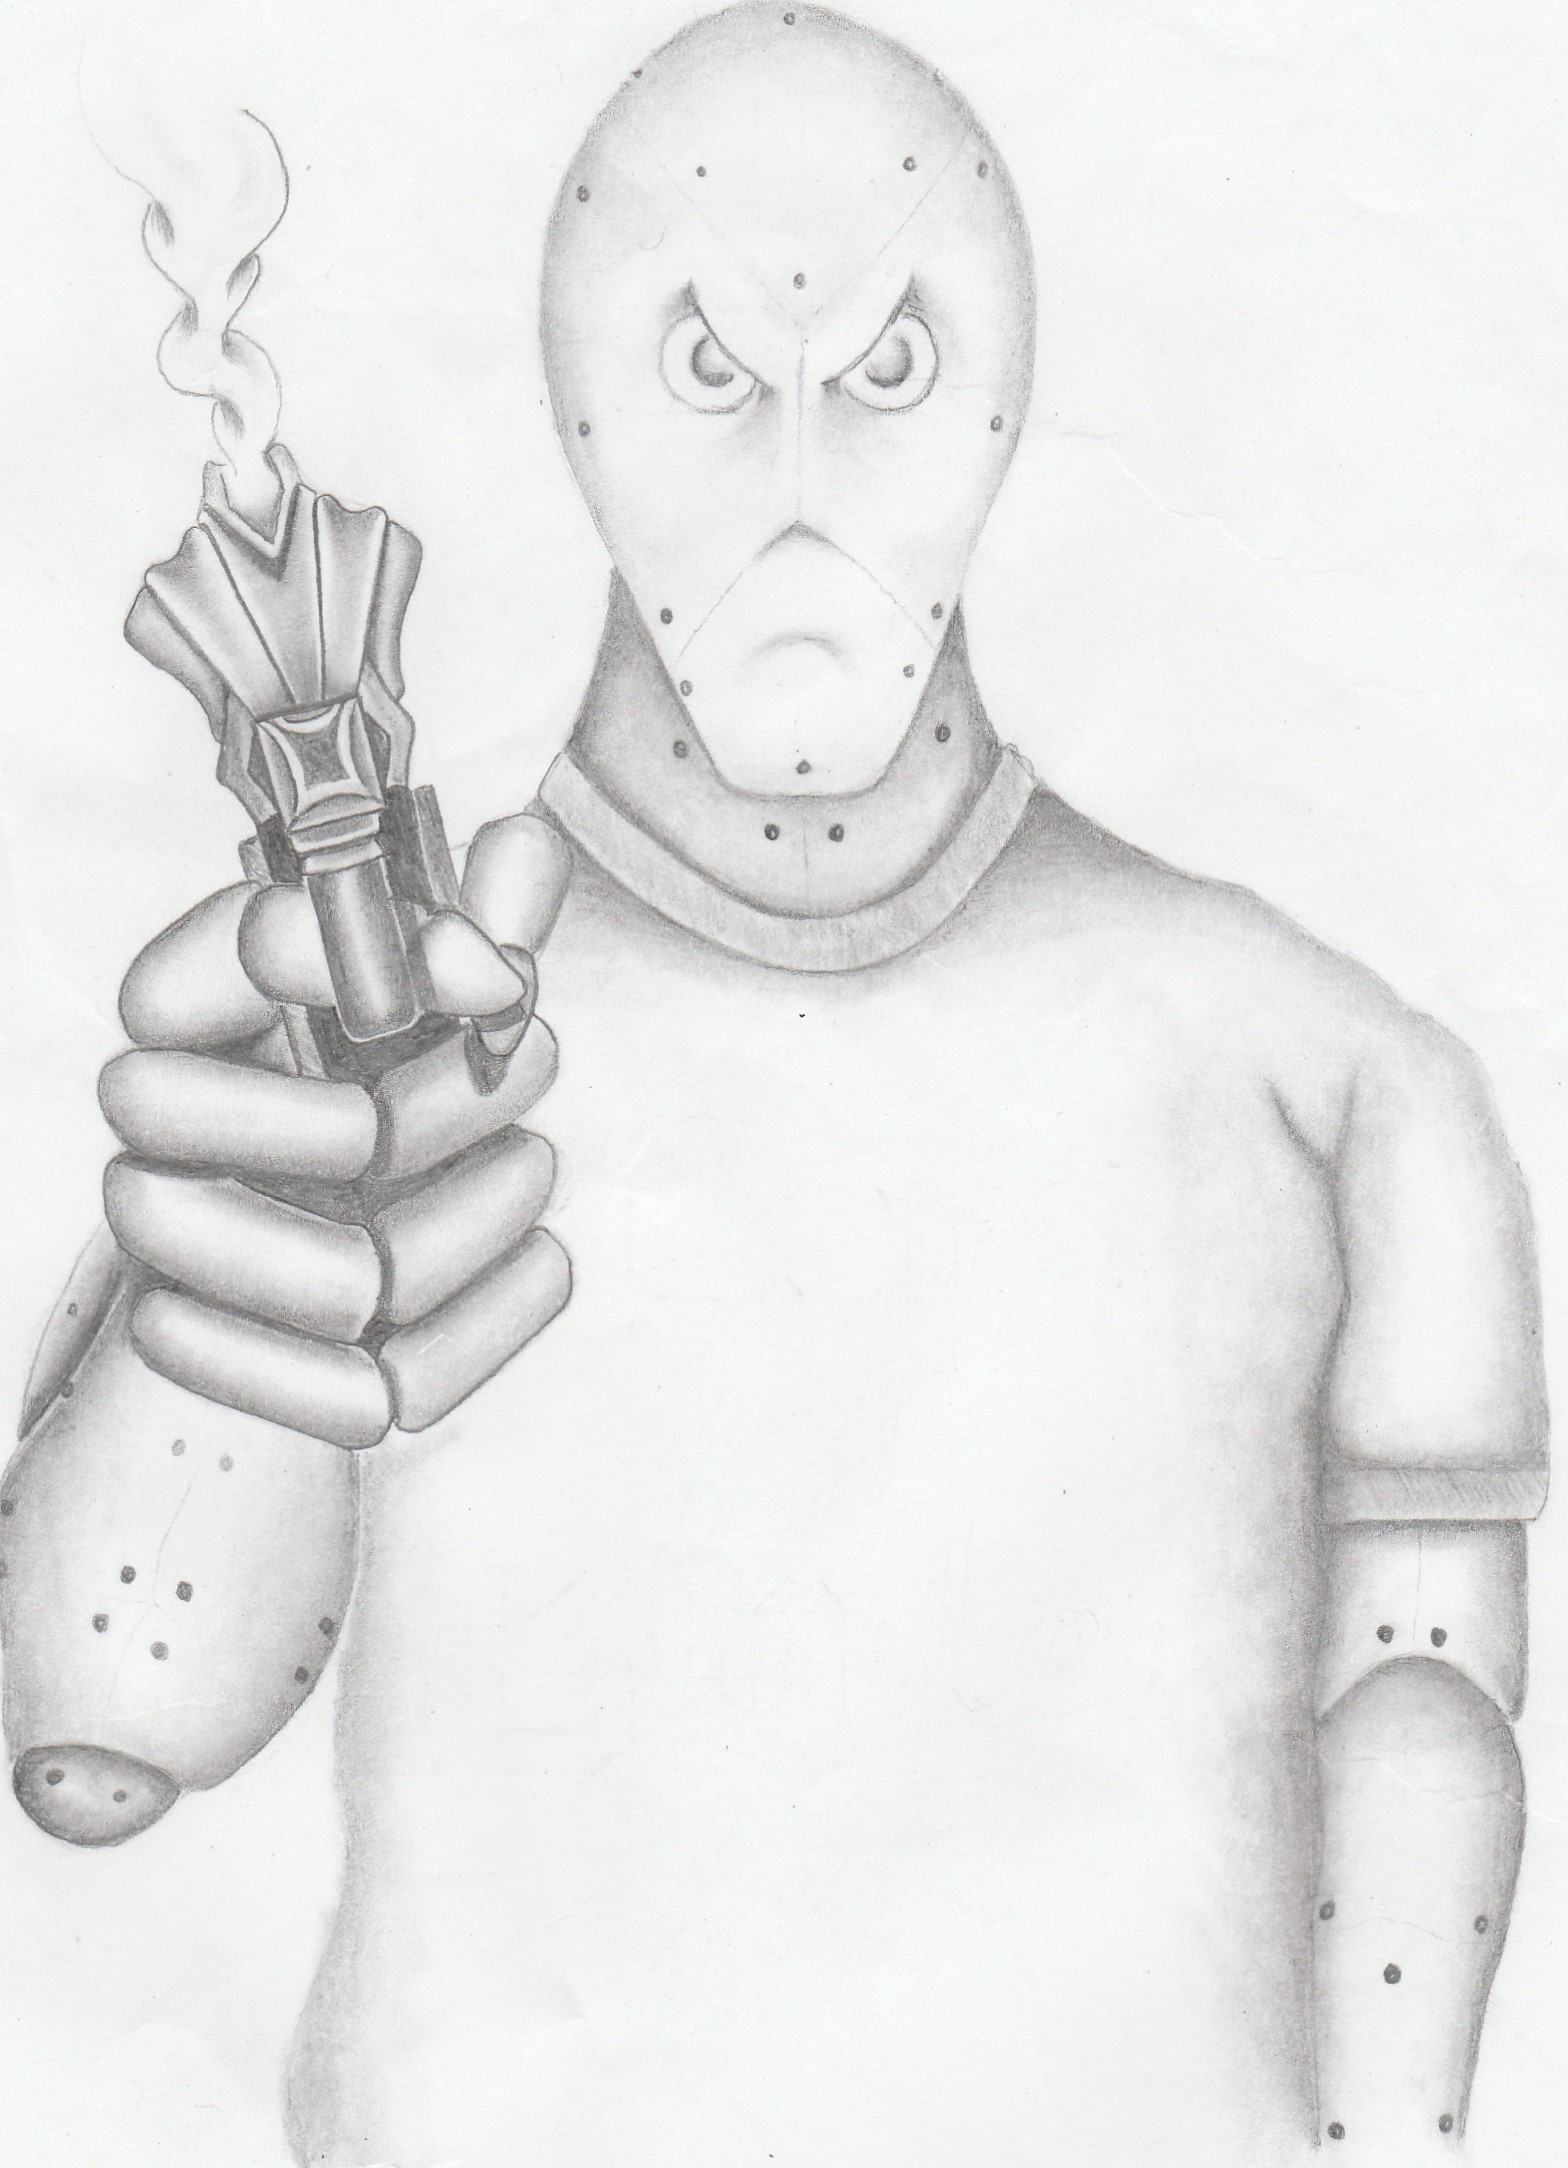 CopBlasterTron Mascot Sketch